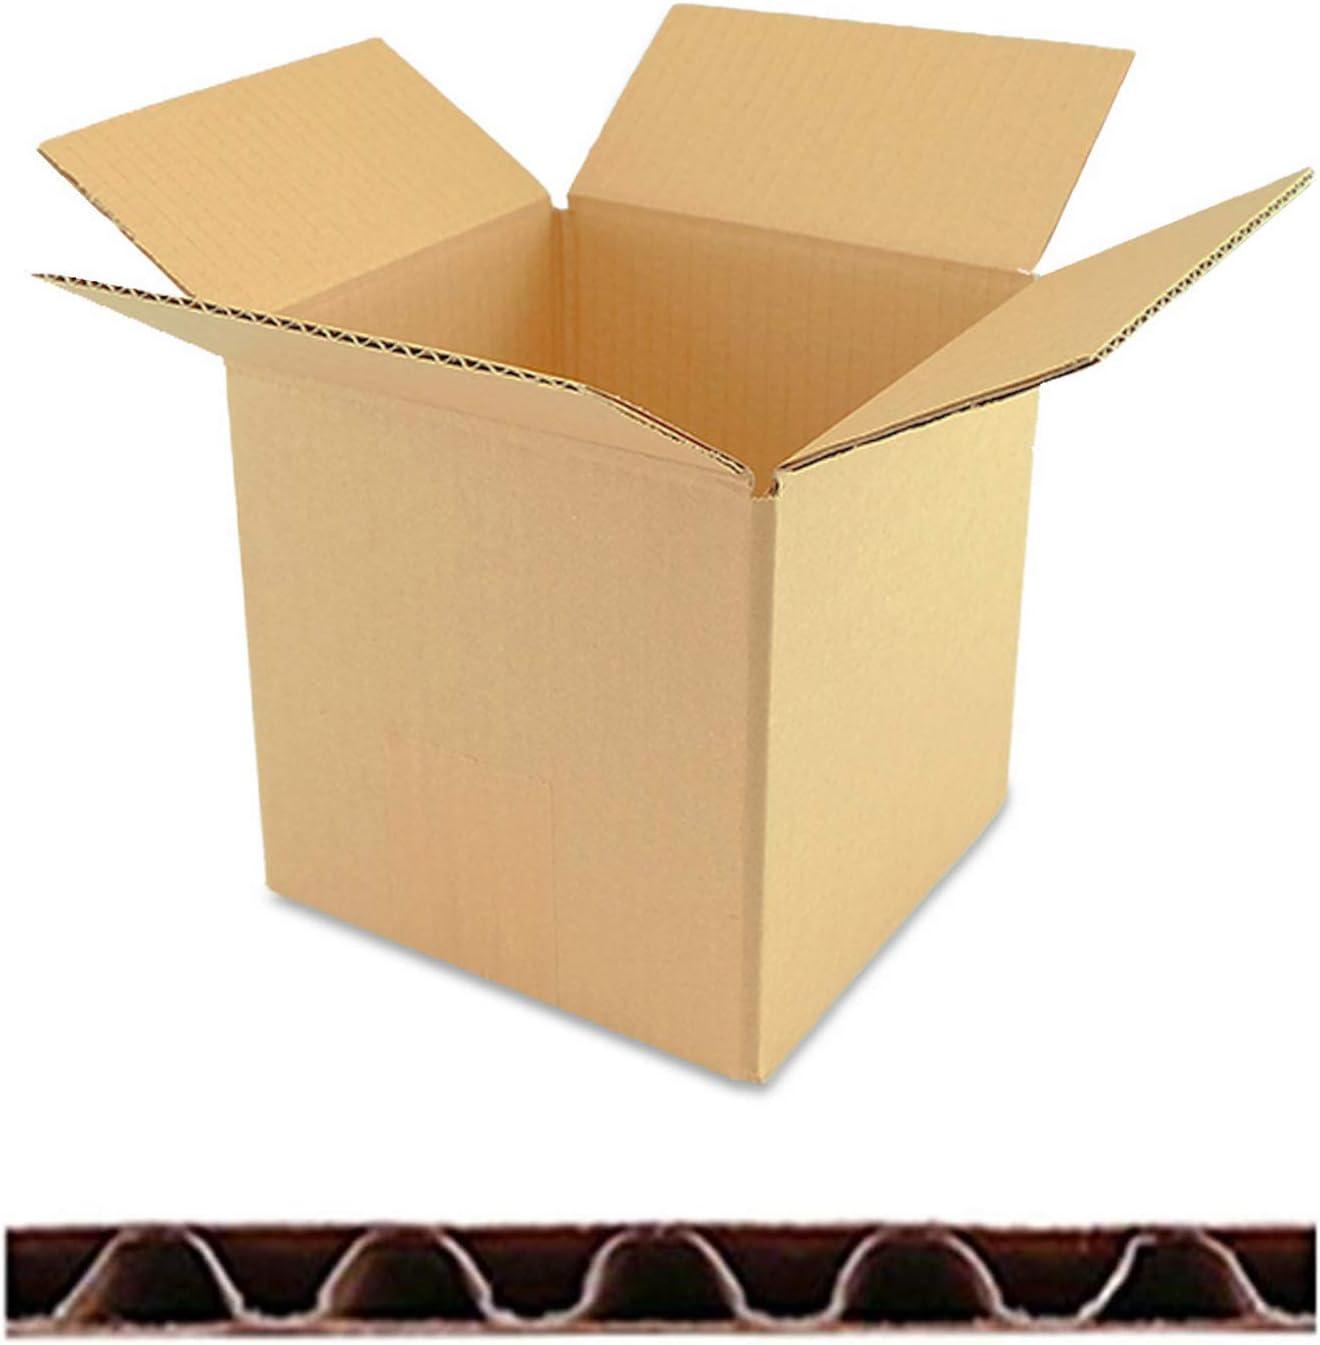 Faltkartons Versandkartons Faltschachteln 190x150x140mm 1 wellig vom Hersteller